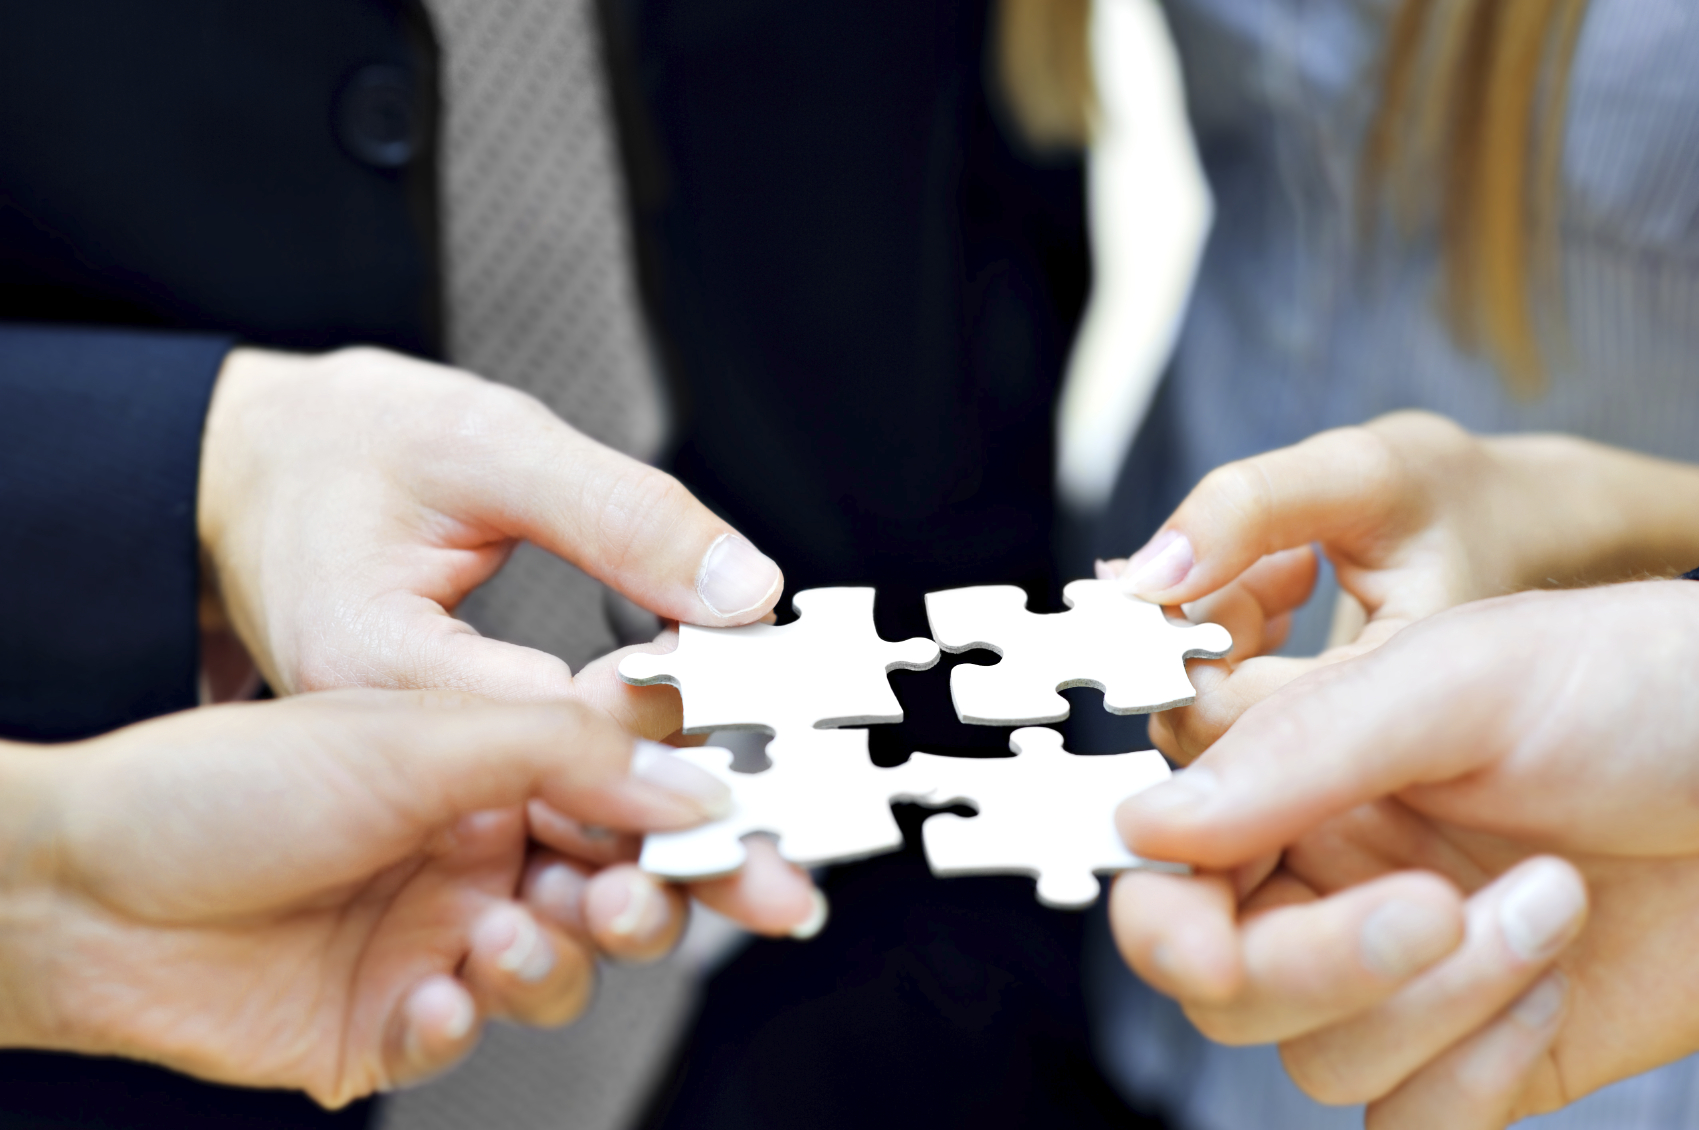 Beratung als effektiver ansatz bewährt um veränderungen anzustoßen